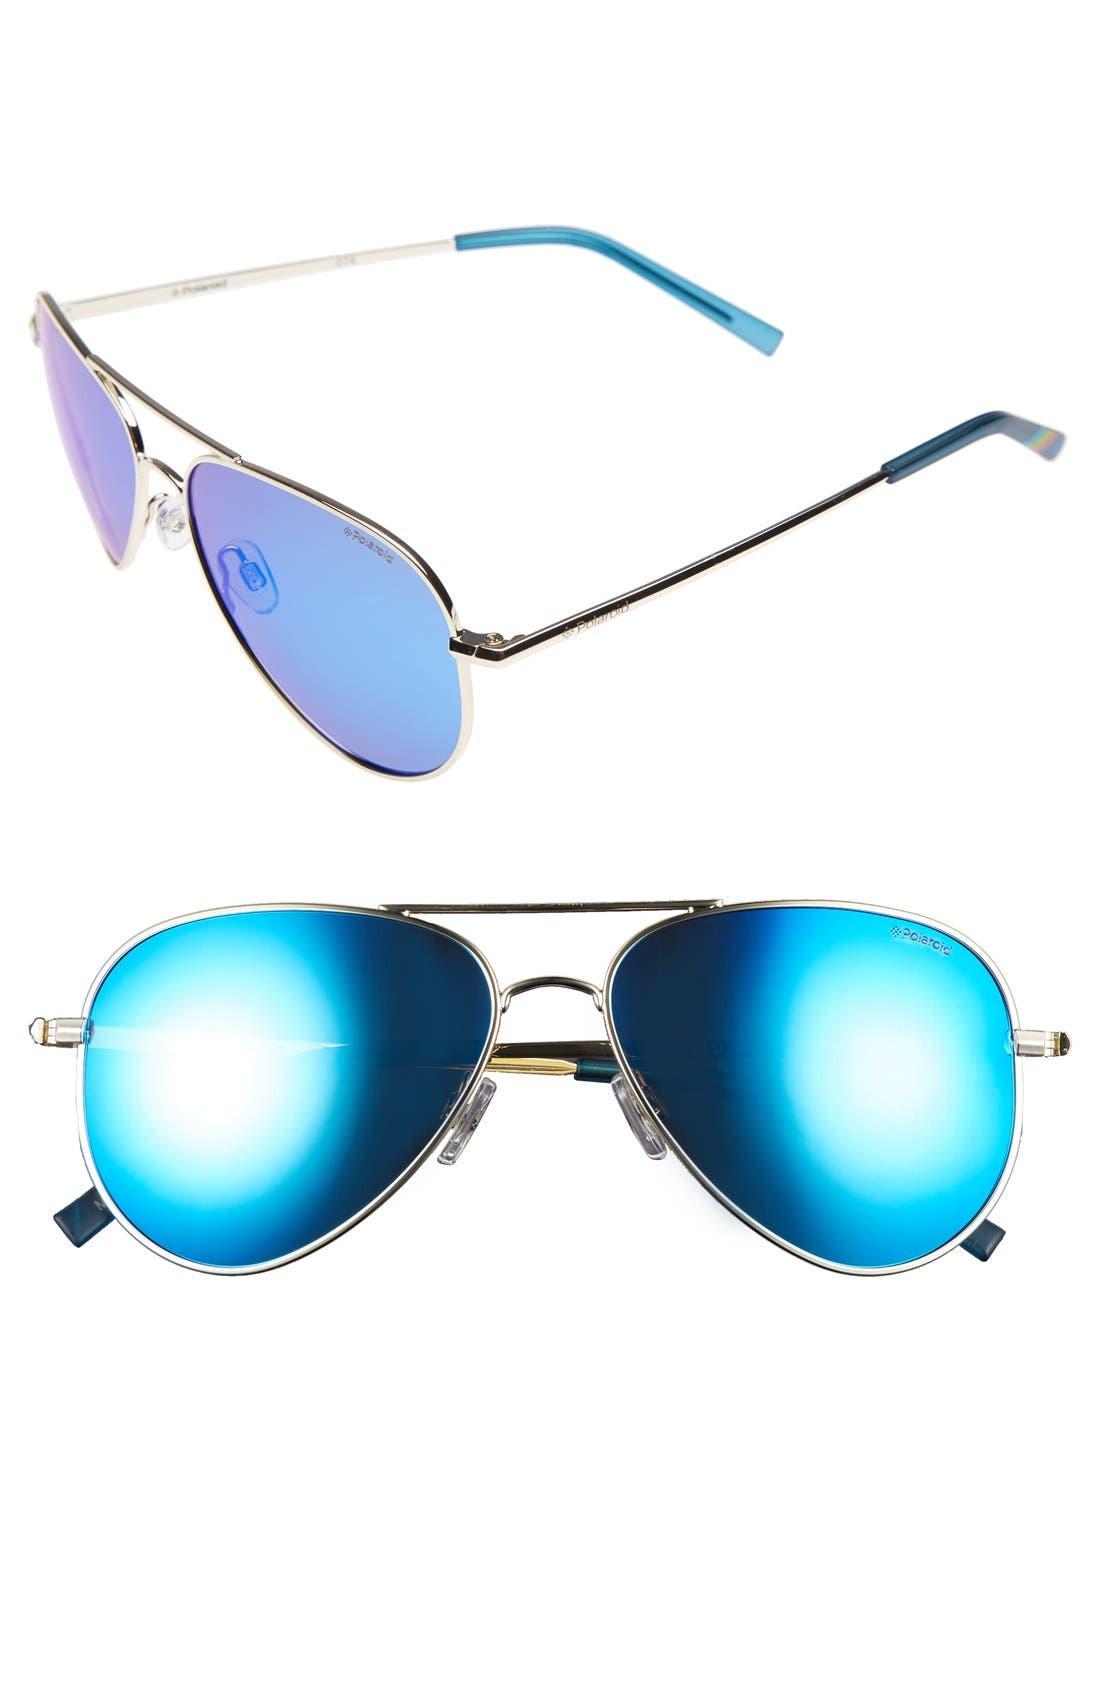 Alternate Image 1 Selected - Polaroid 6012/N 56mm Polarized Aviator Sunglasses